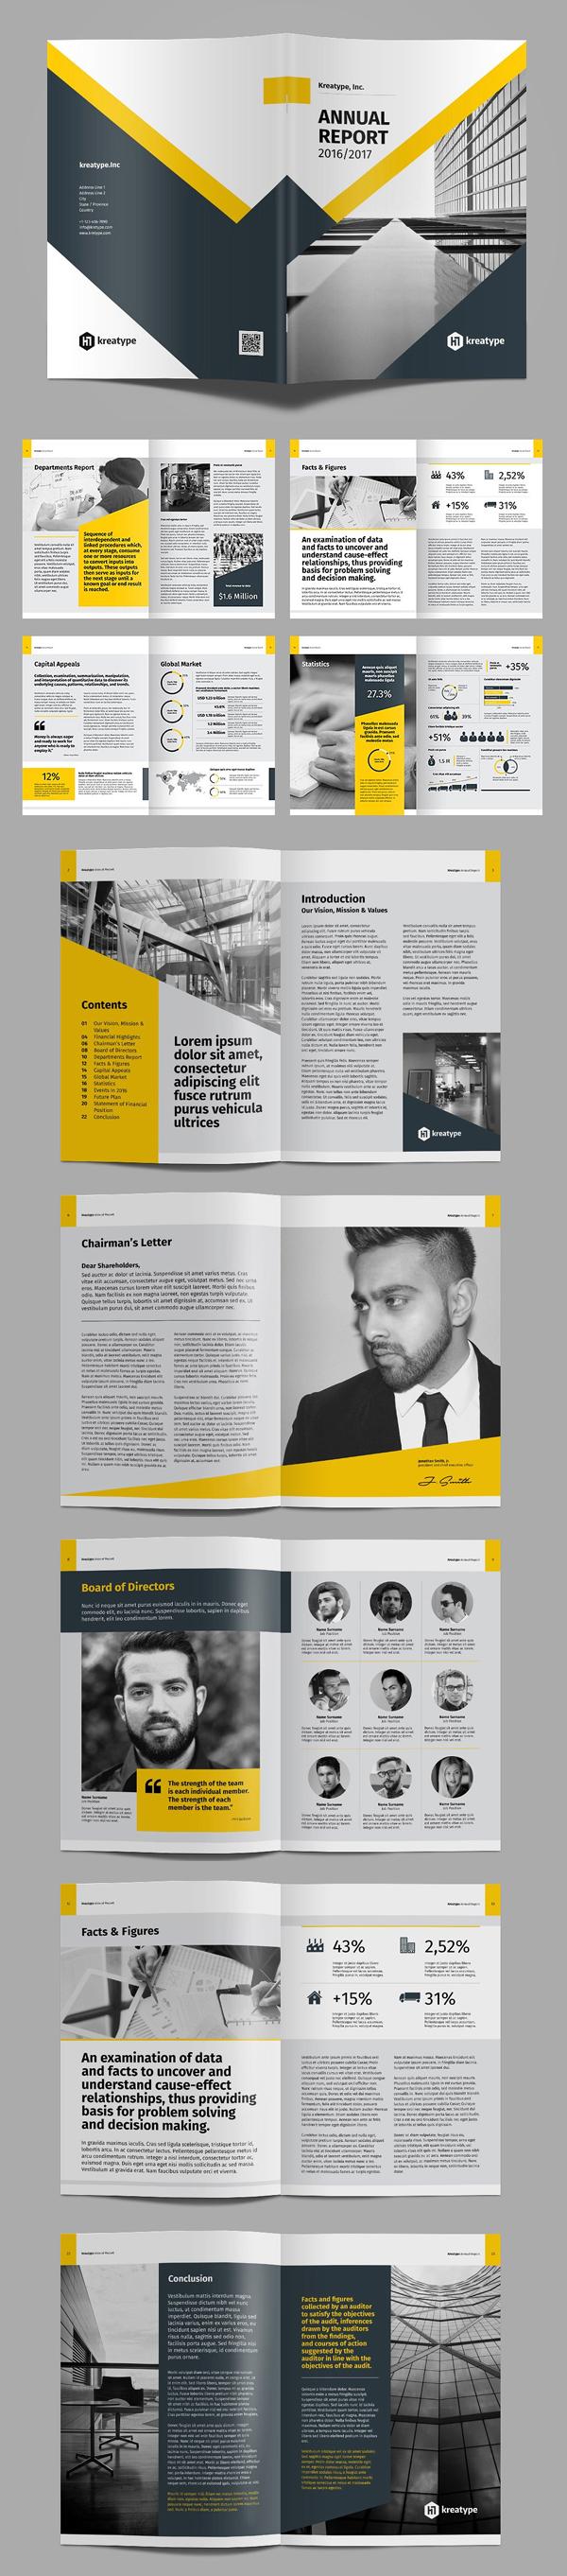 100 Professional Corporate Brochure Templates - 19